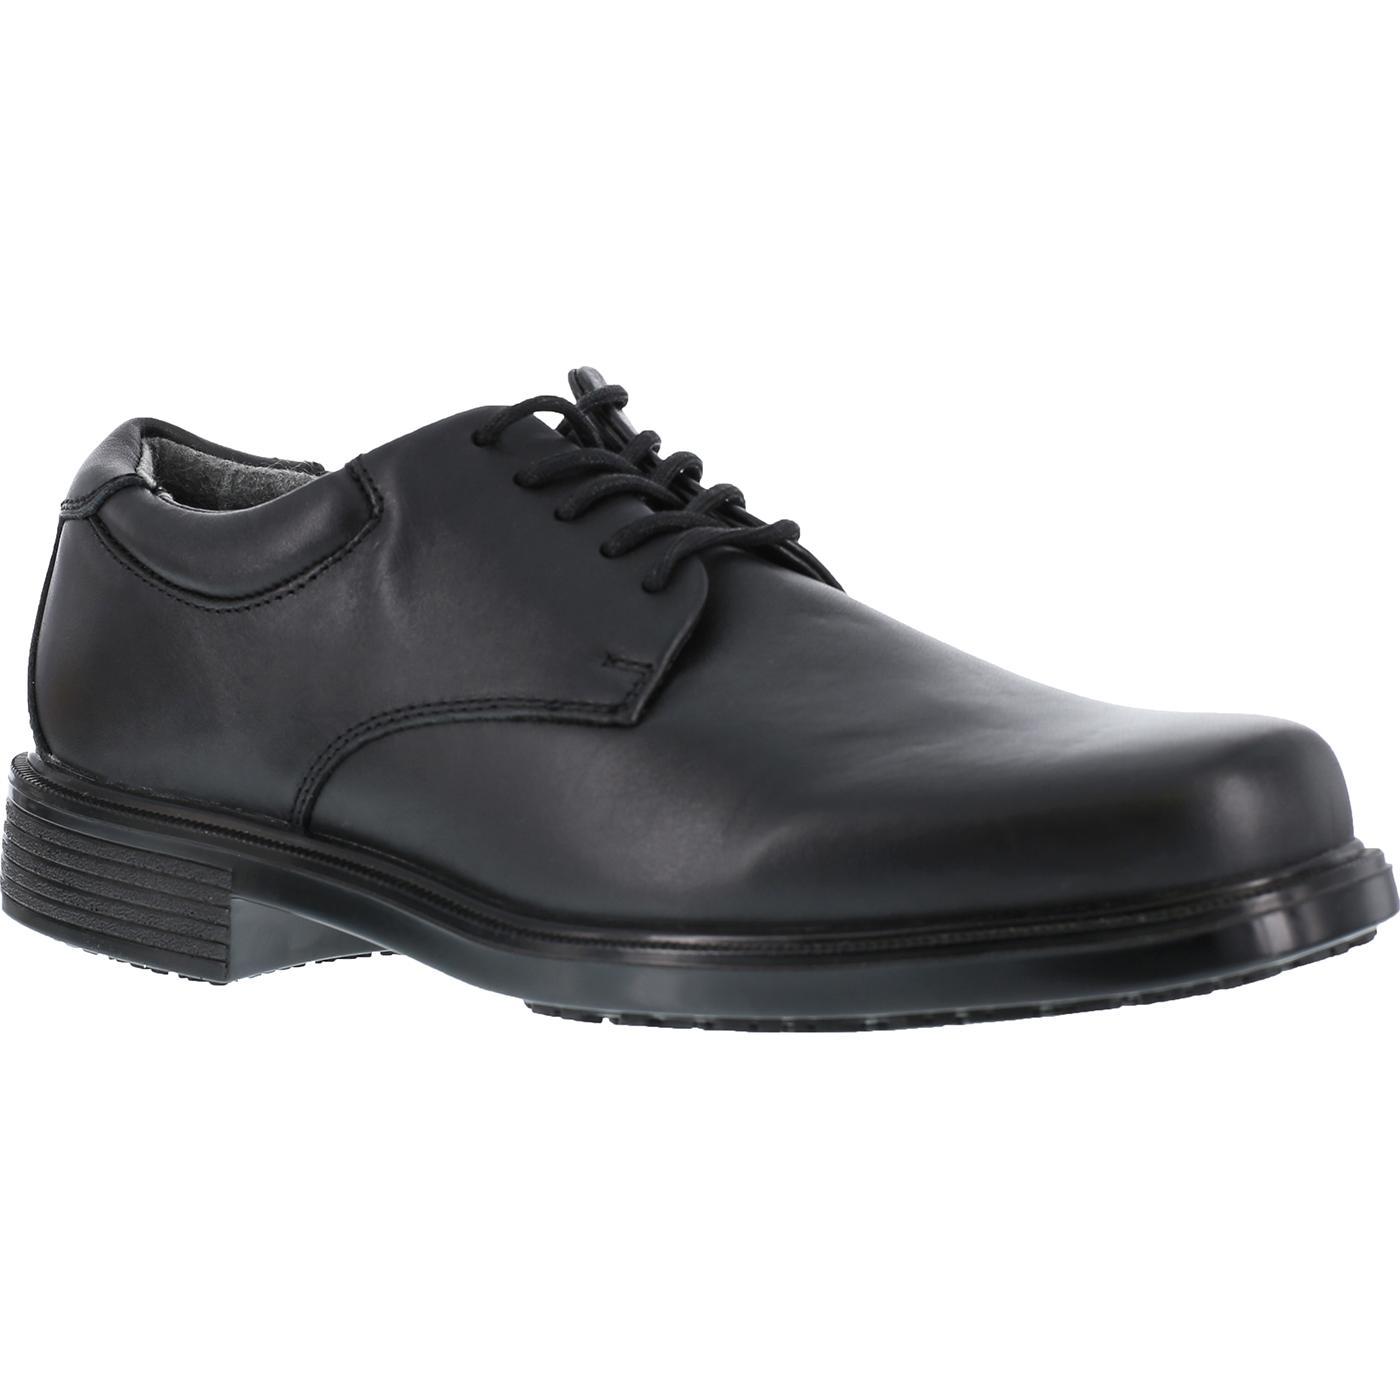 Sas Mens Non Slip Shoes